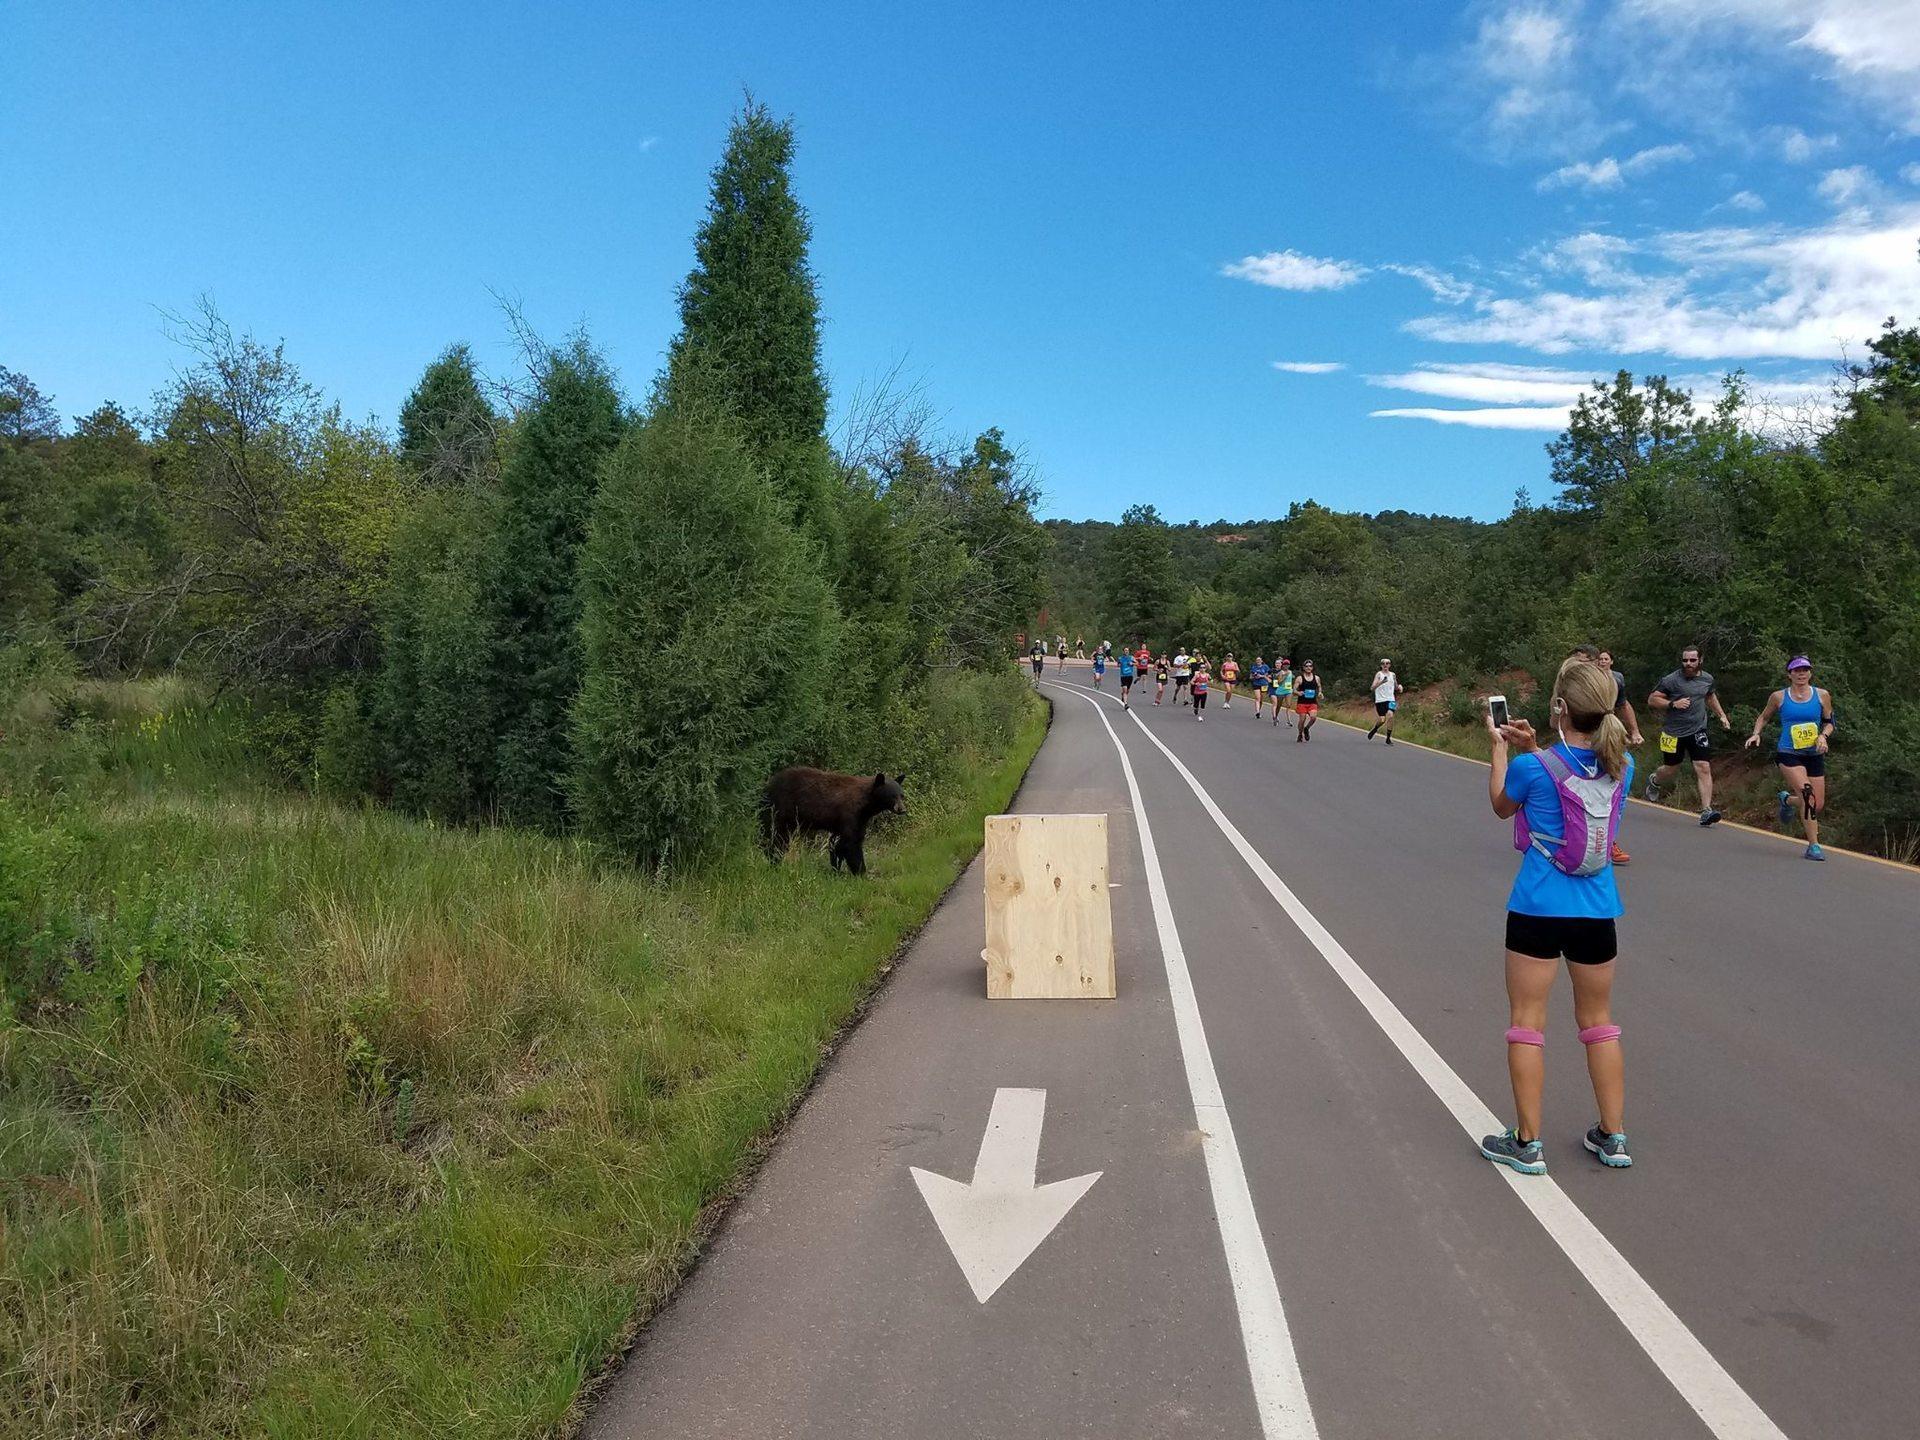 bear in running race2.jpg